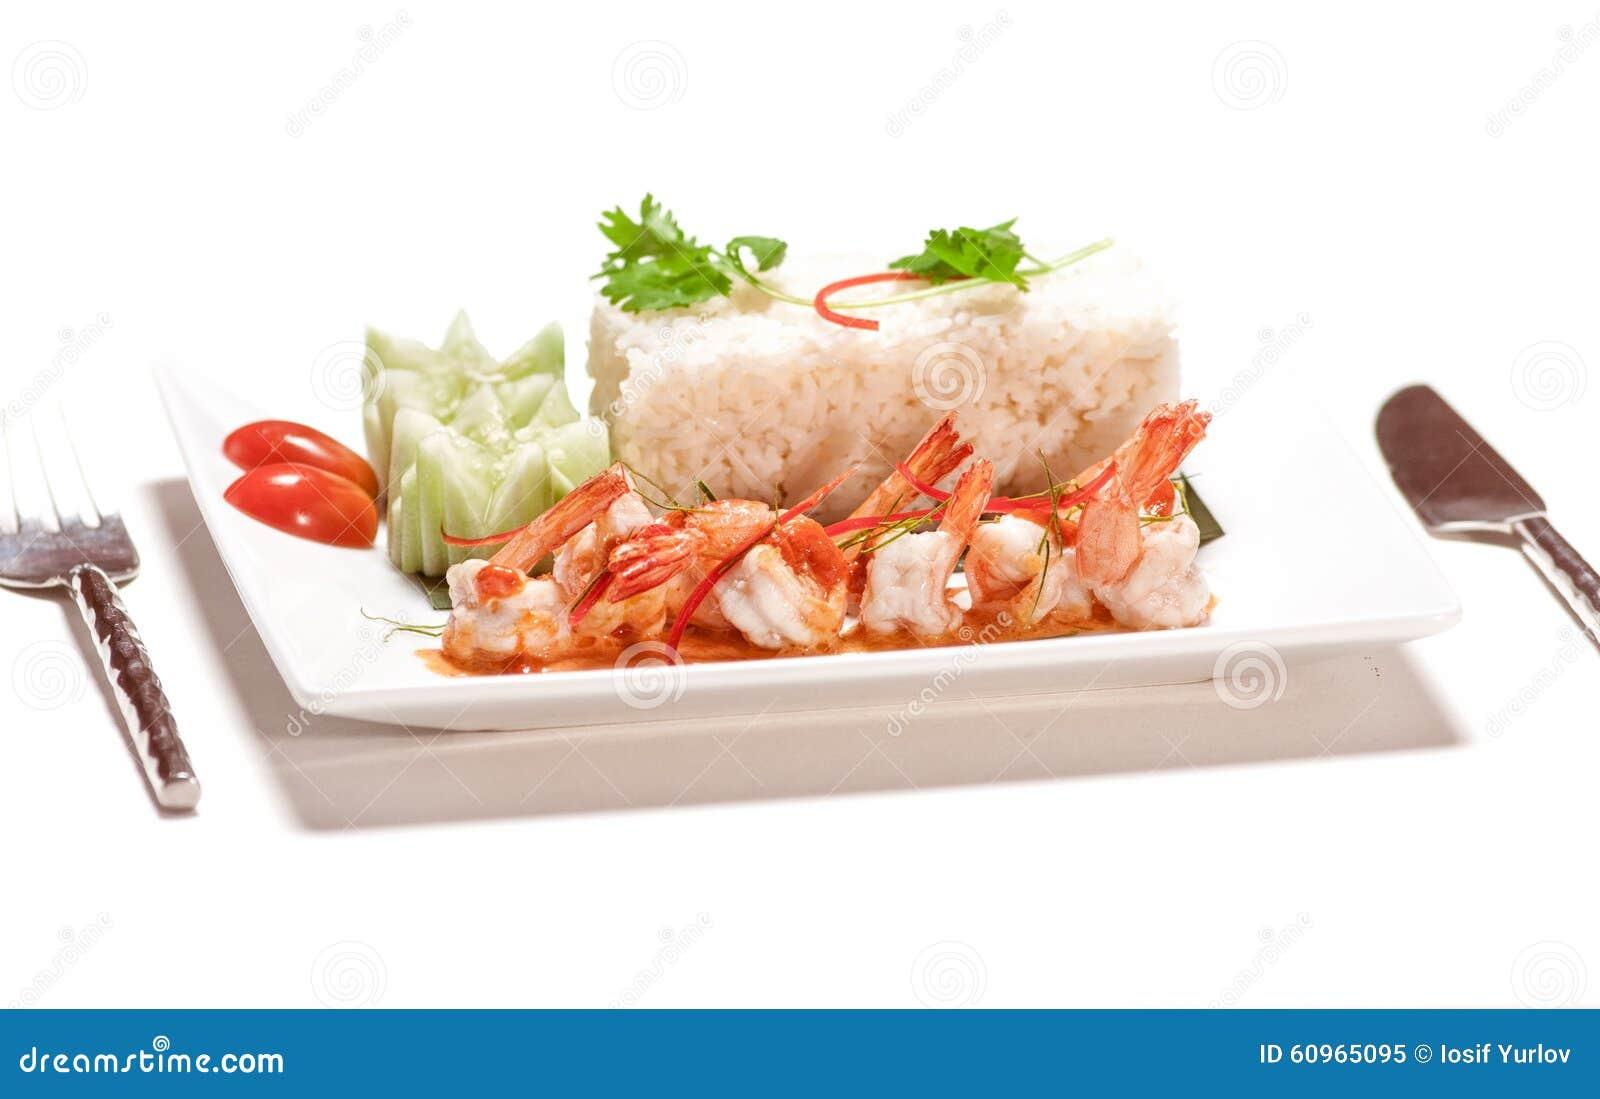 Disegno cucina internazionale : Piatti Di Cucina Internazionale In Ristorante Immagine Stock ...